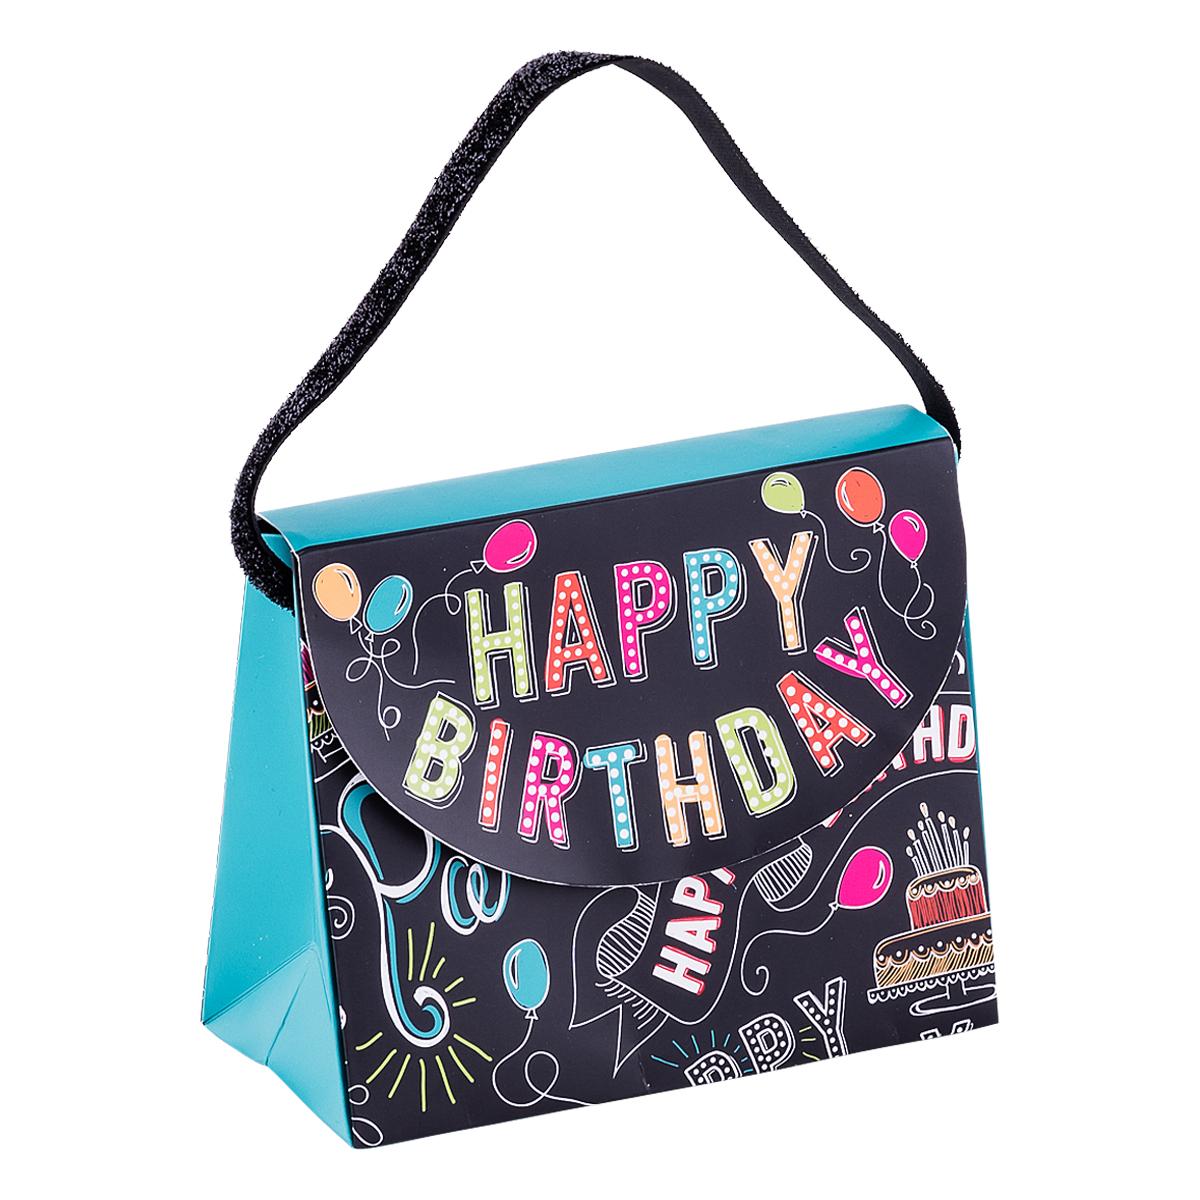 Candy Purse Happy Birthday